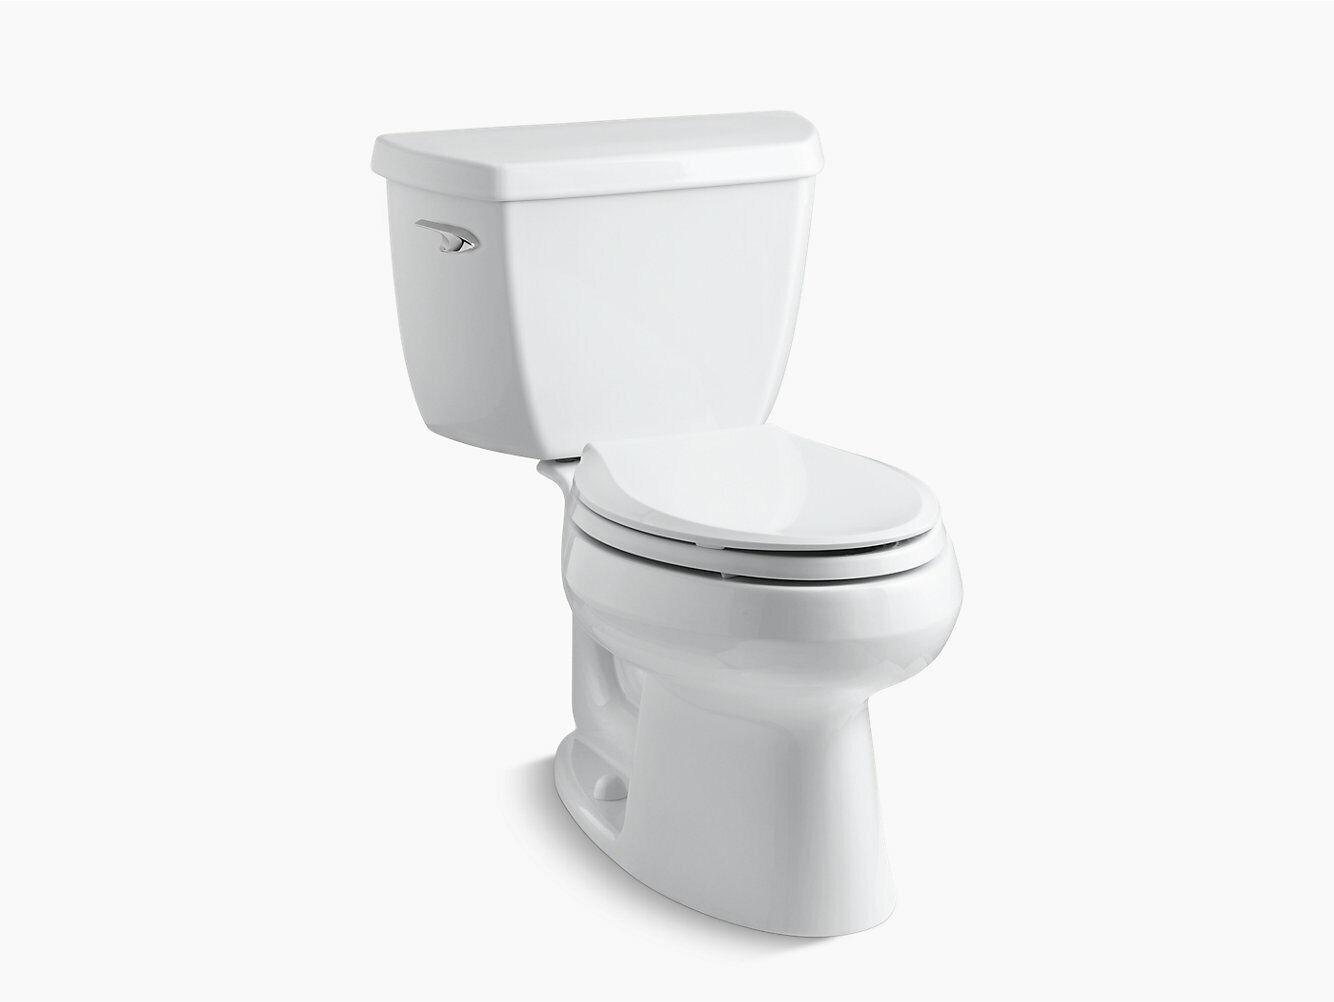 Kohler Elongated Toilet Seat Biscuit Toilet Seat